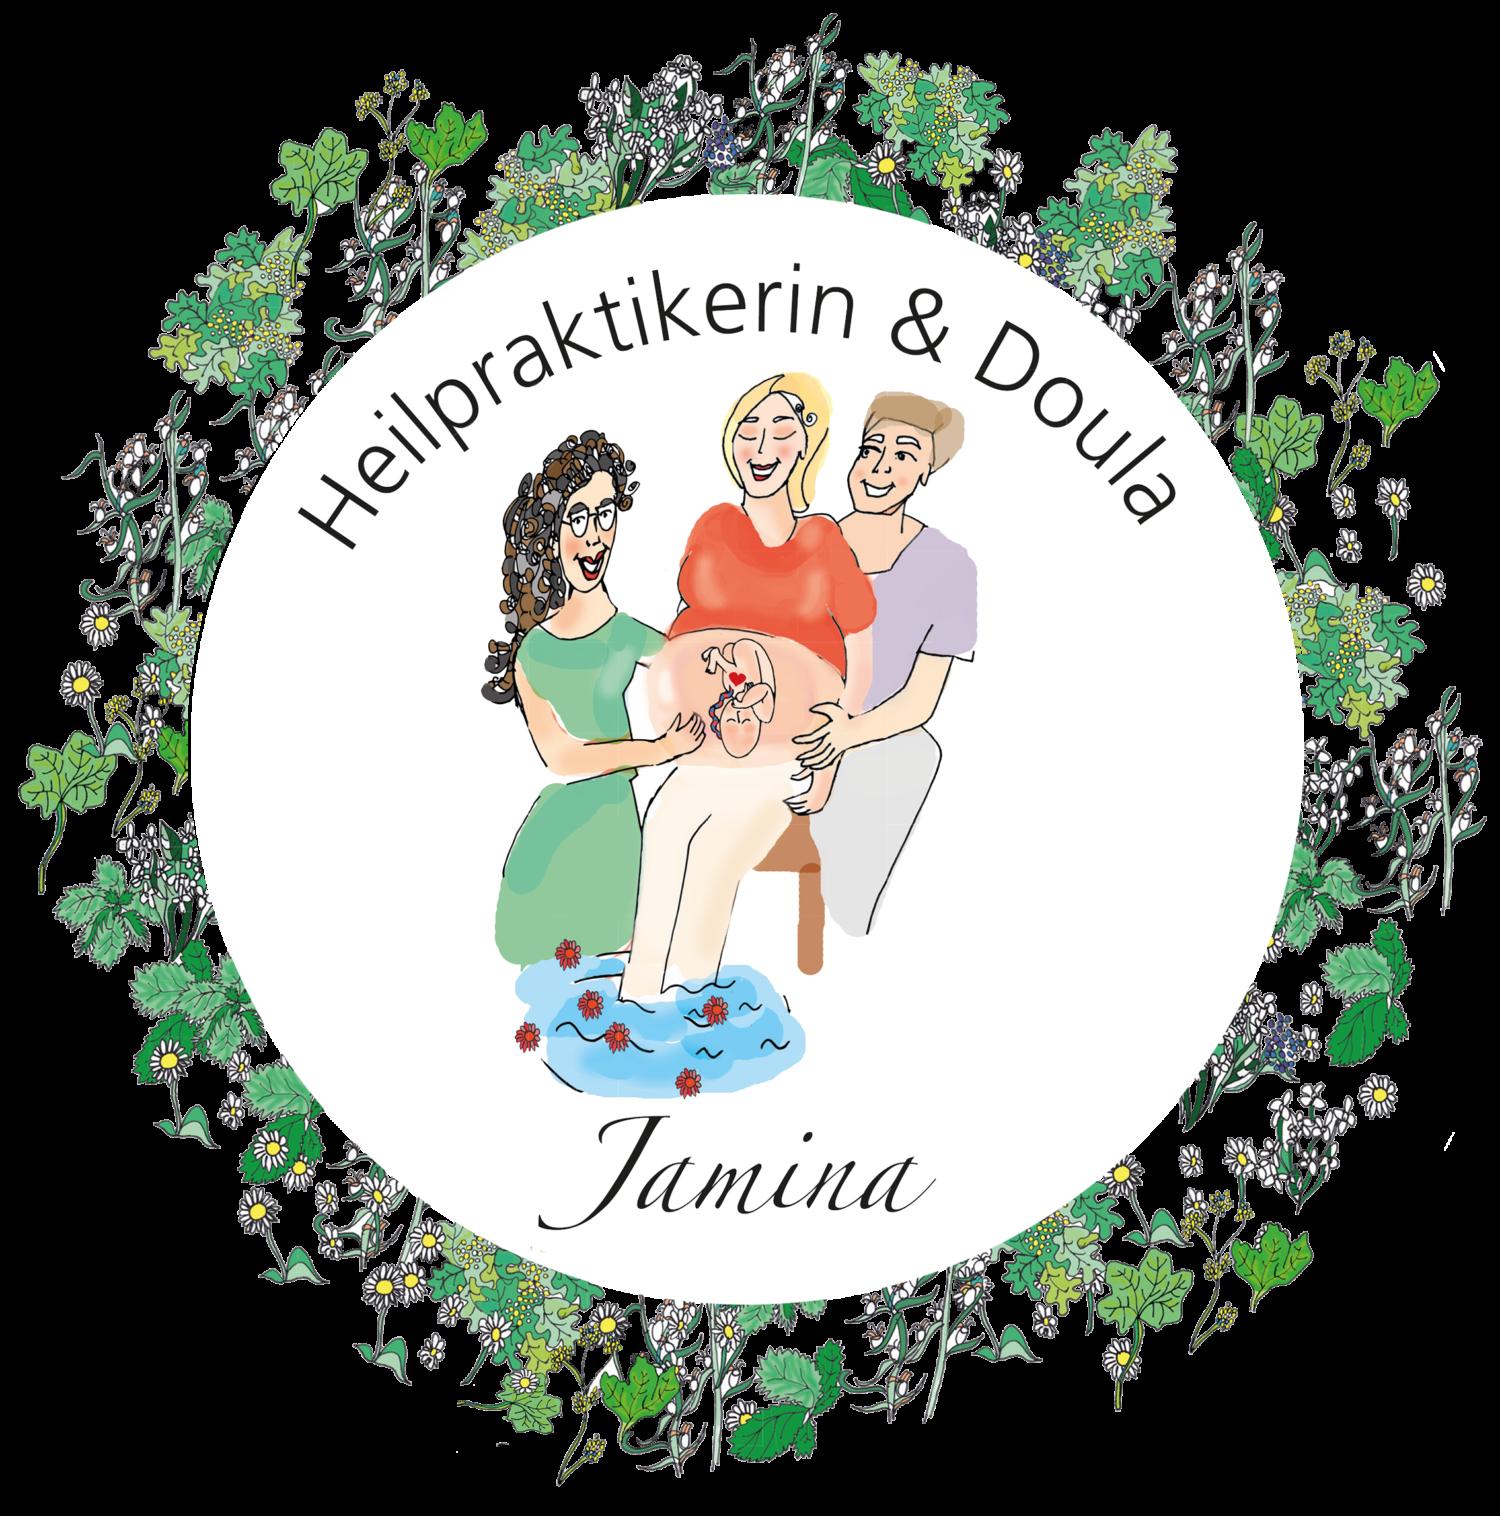 Heilpraktikerin & Doula